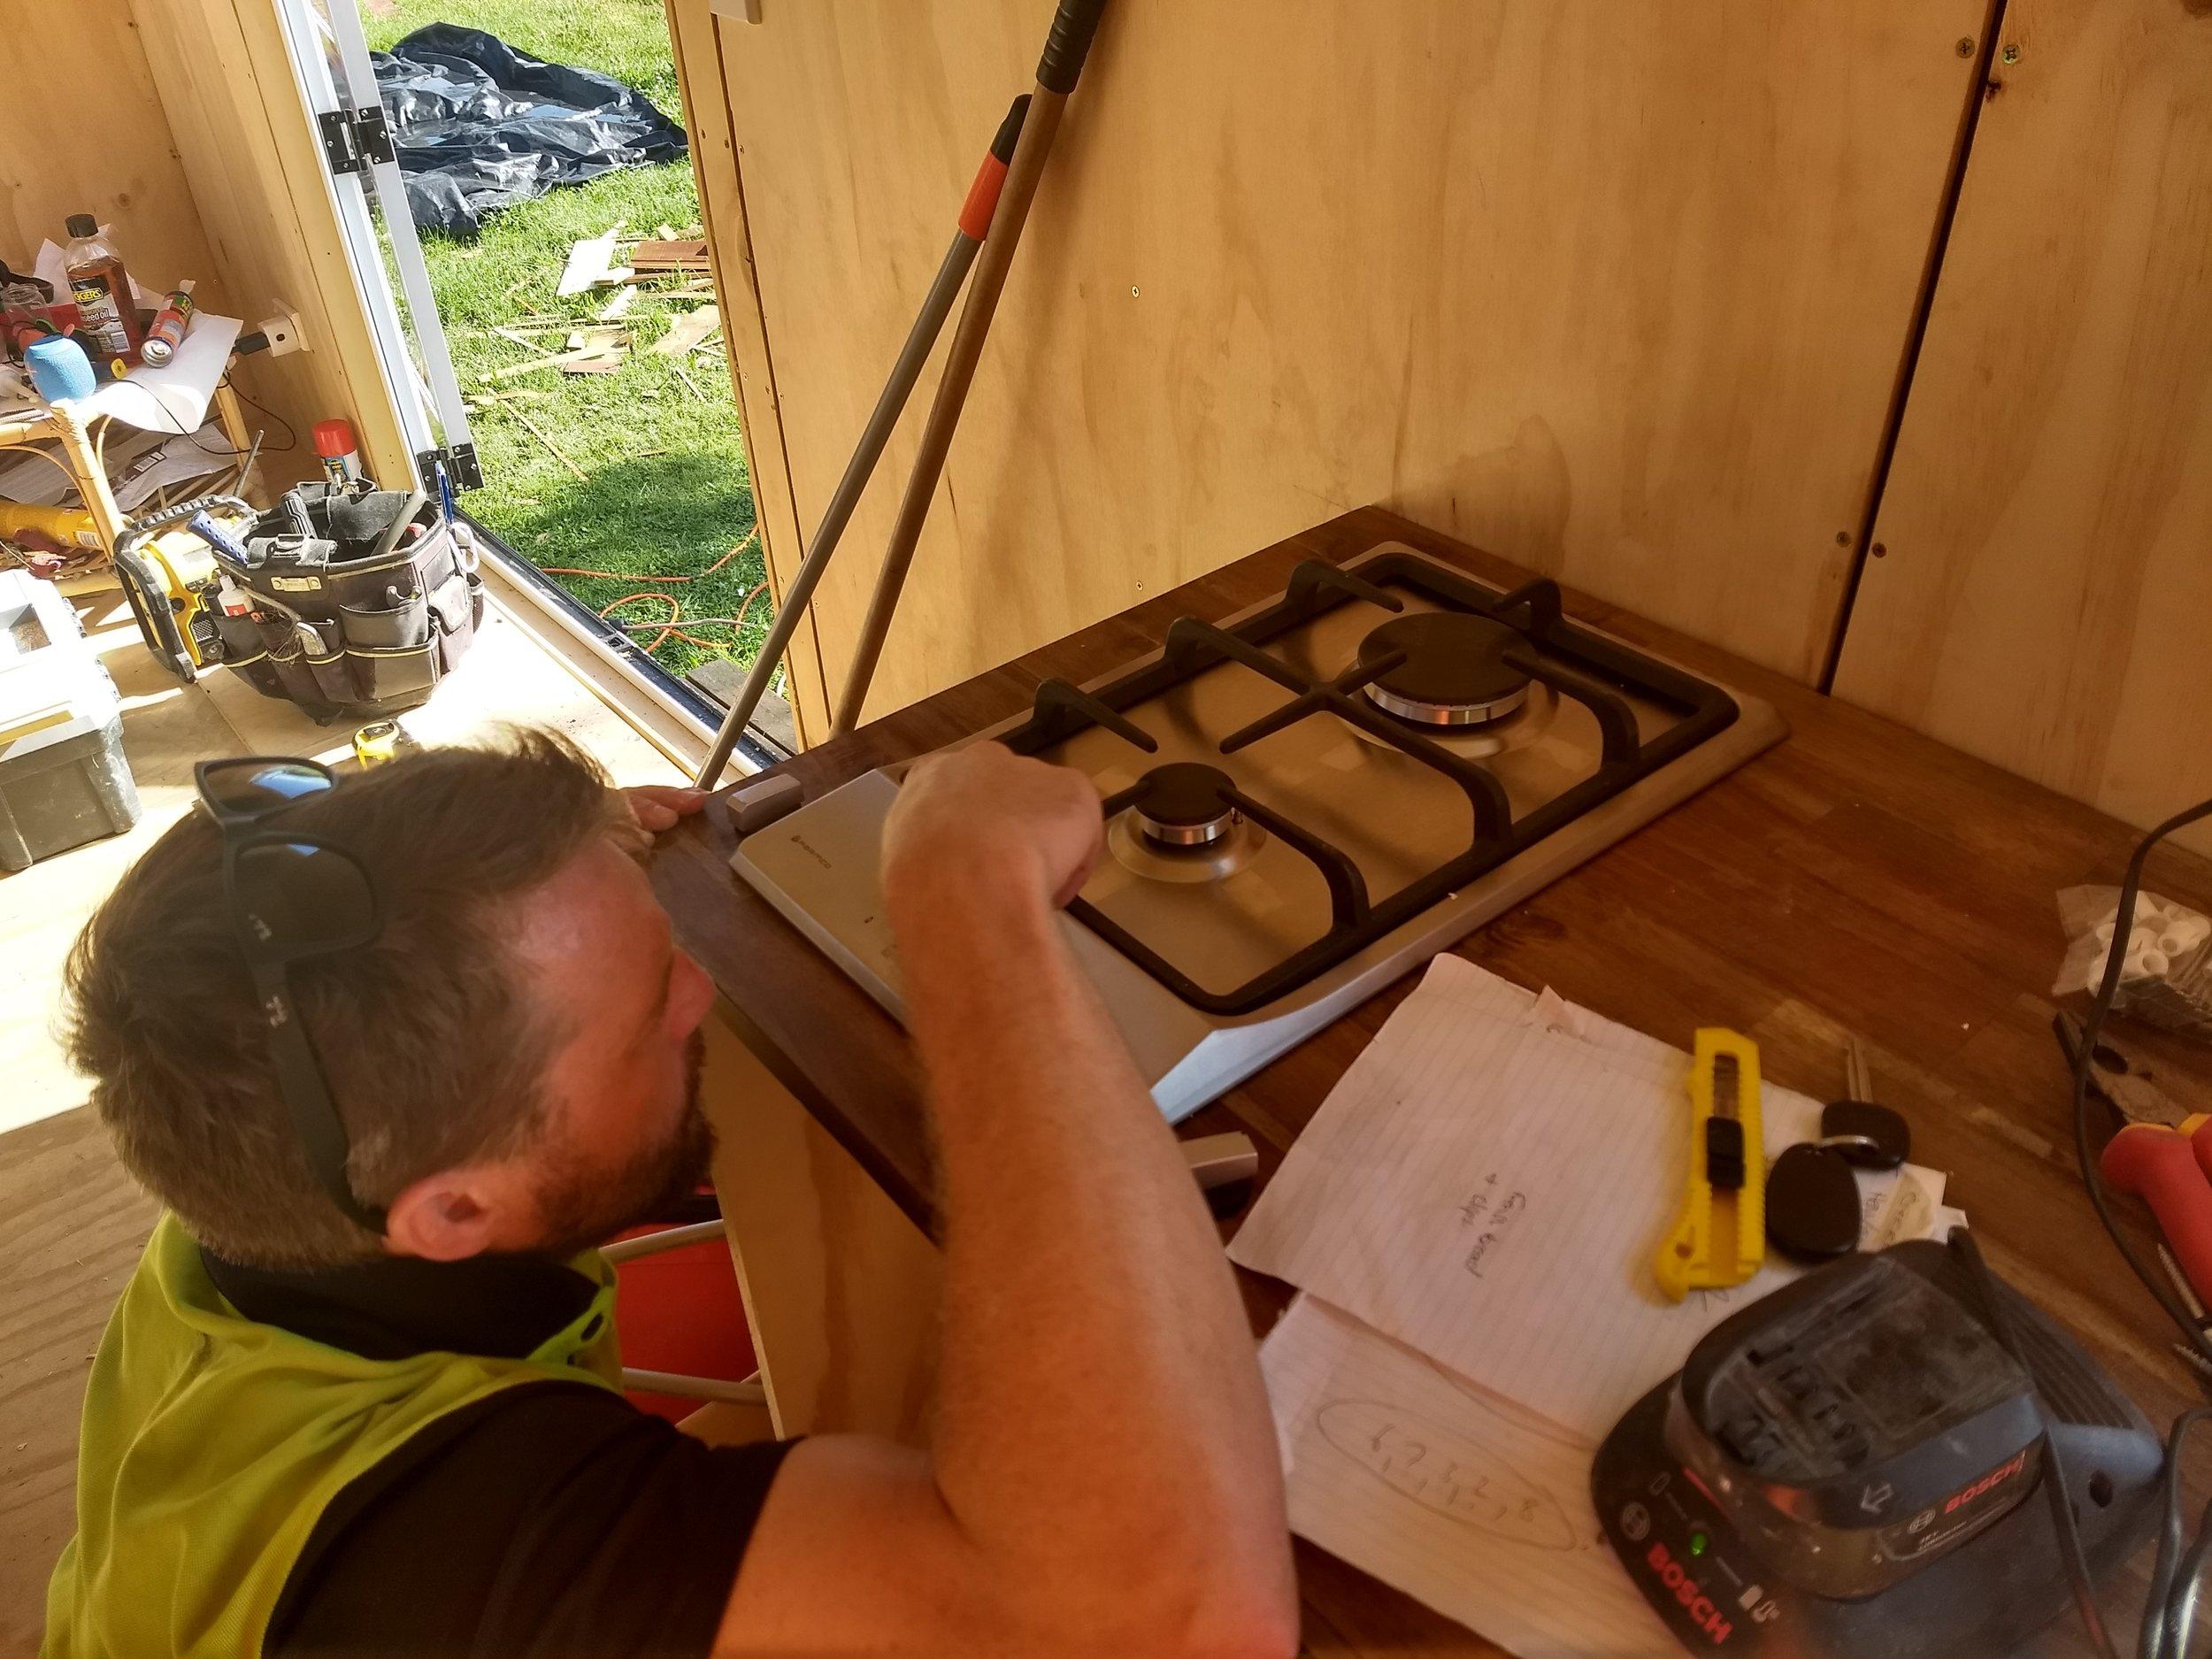 Craig calibrating the hob.